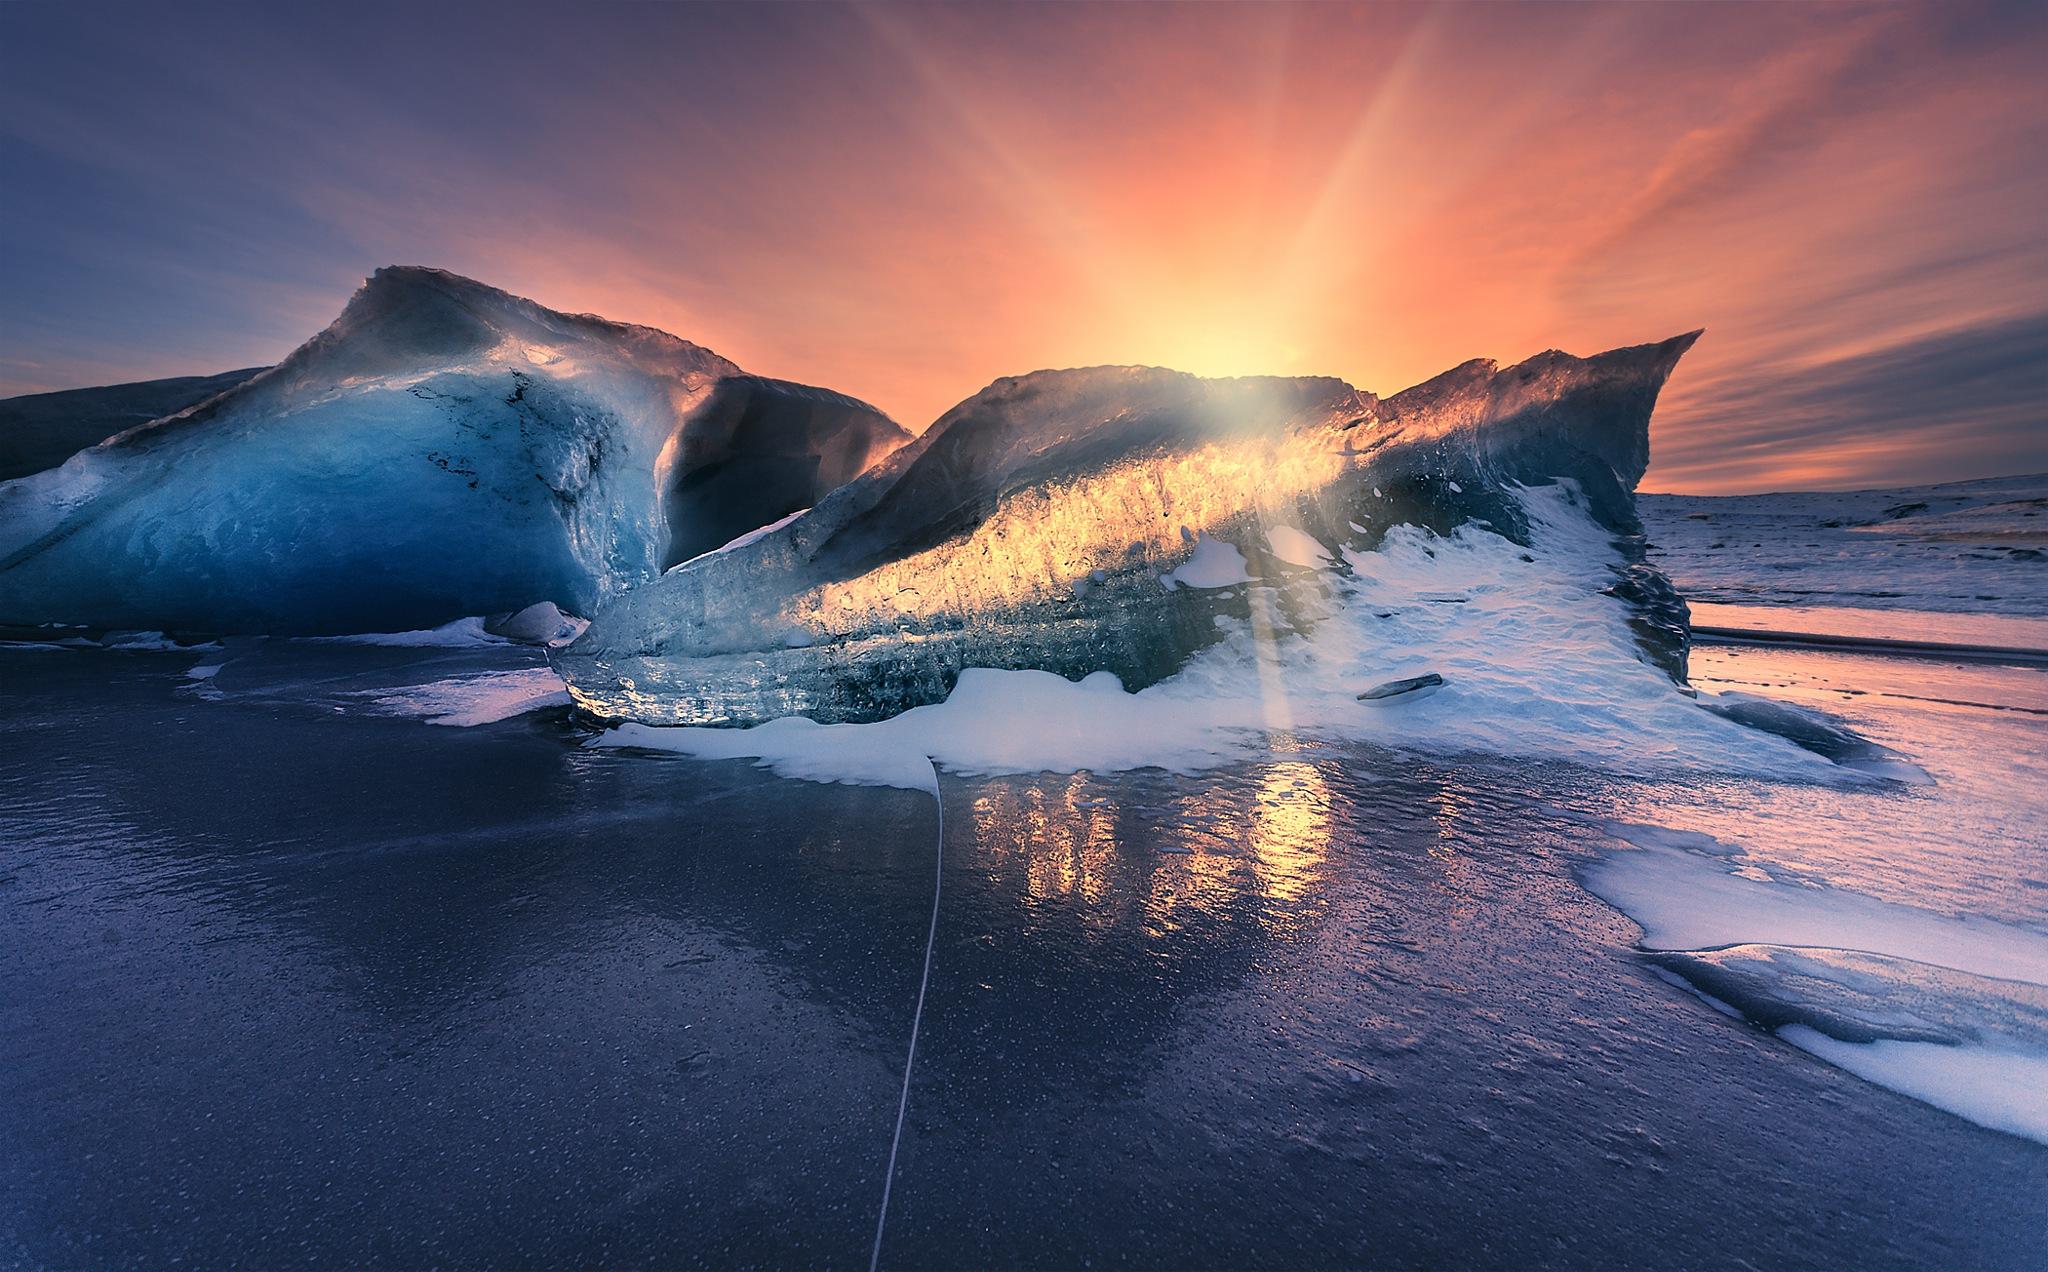 Игра света и льда by Siarhei Mikhaliuk